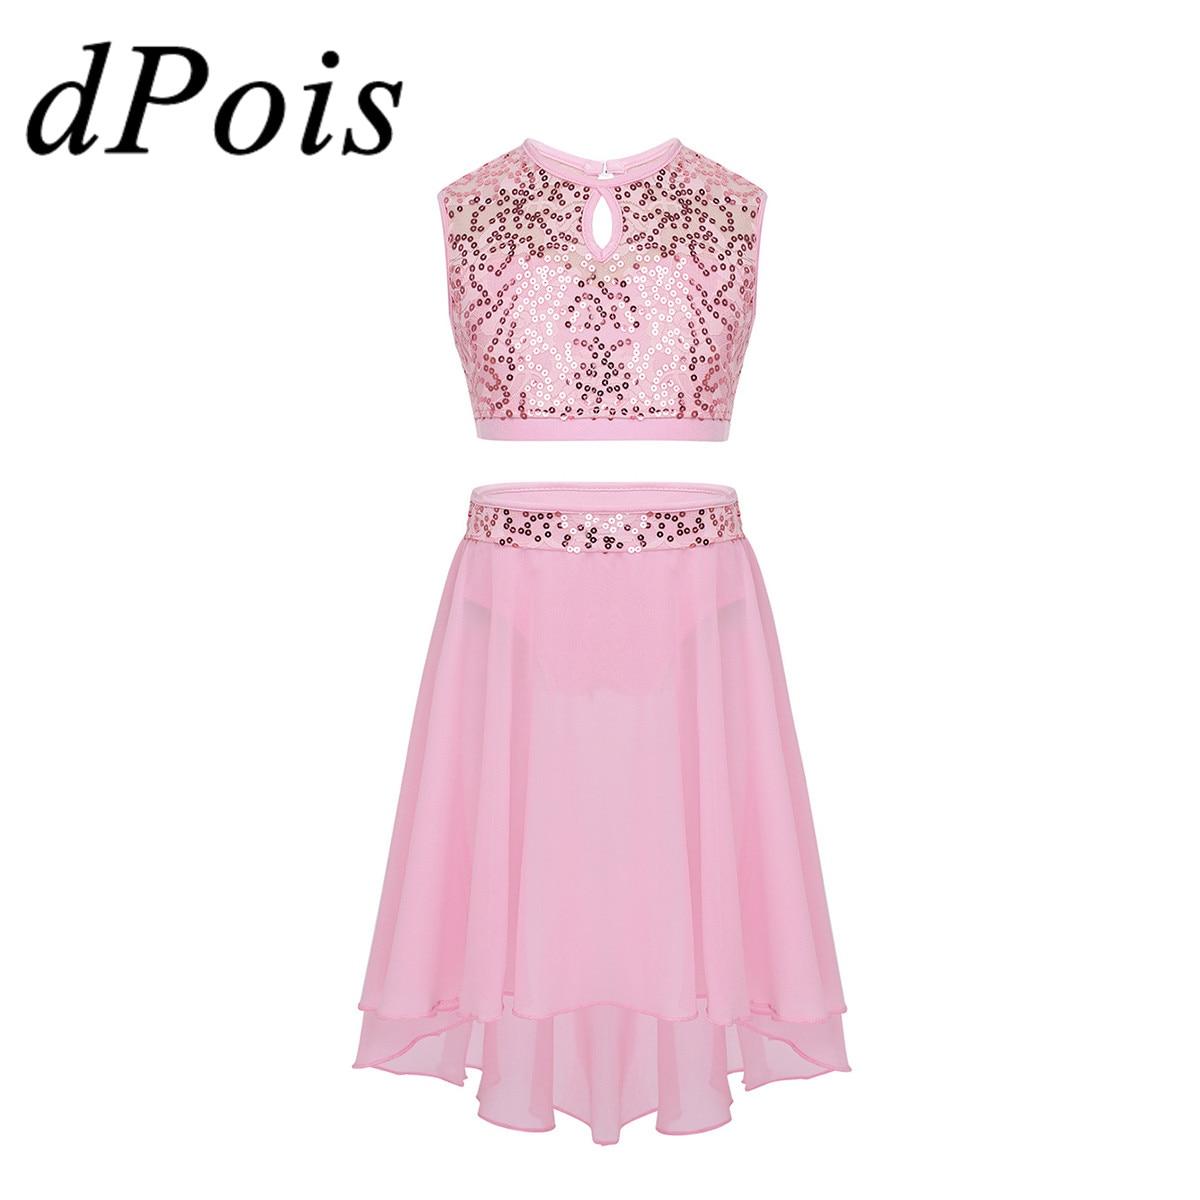 DPOIS Kids Girls Ballerina Costume Ballet Dance Dress Outfit Child Lyrical Praise Stage Dance Wear Sequins Crop Top & Tutu Skirt